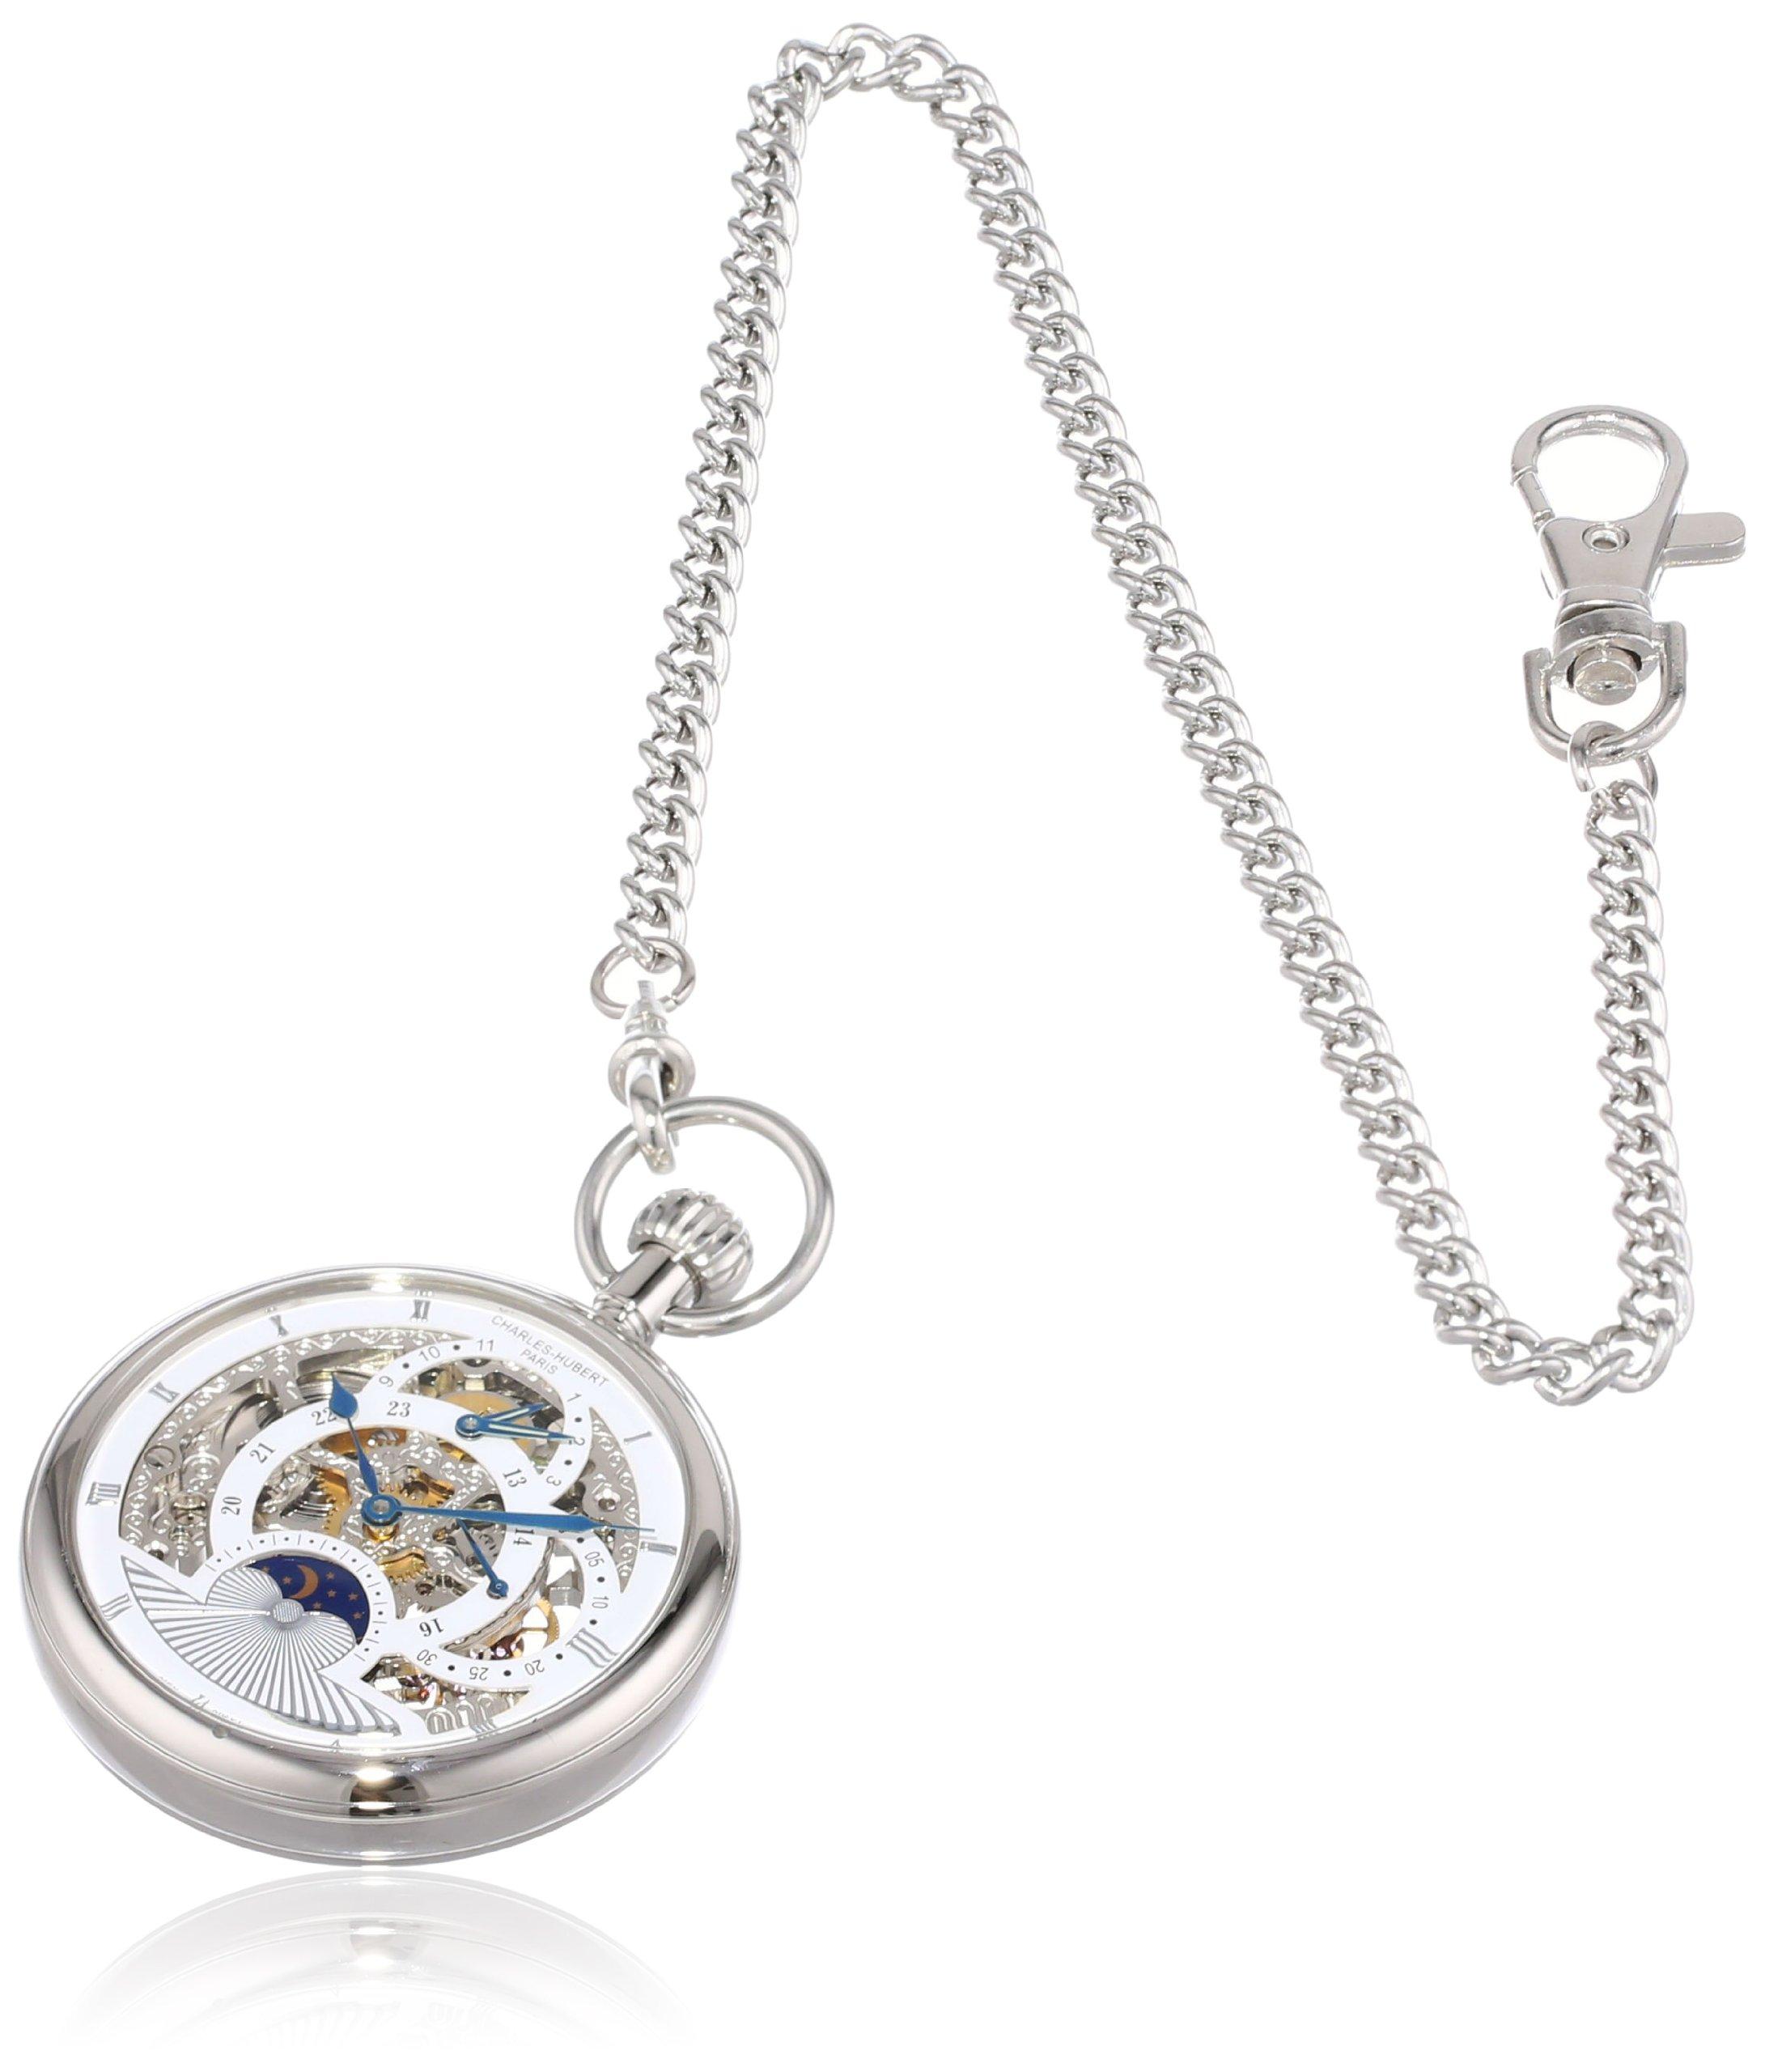 Charles Hubert 3816-W Dual Time Mechanical Pocket Watch